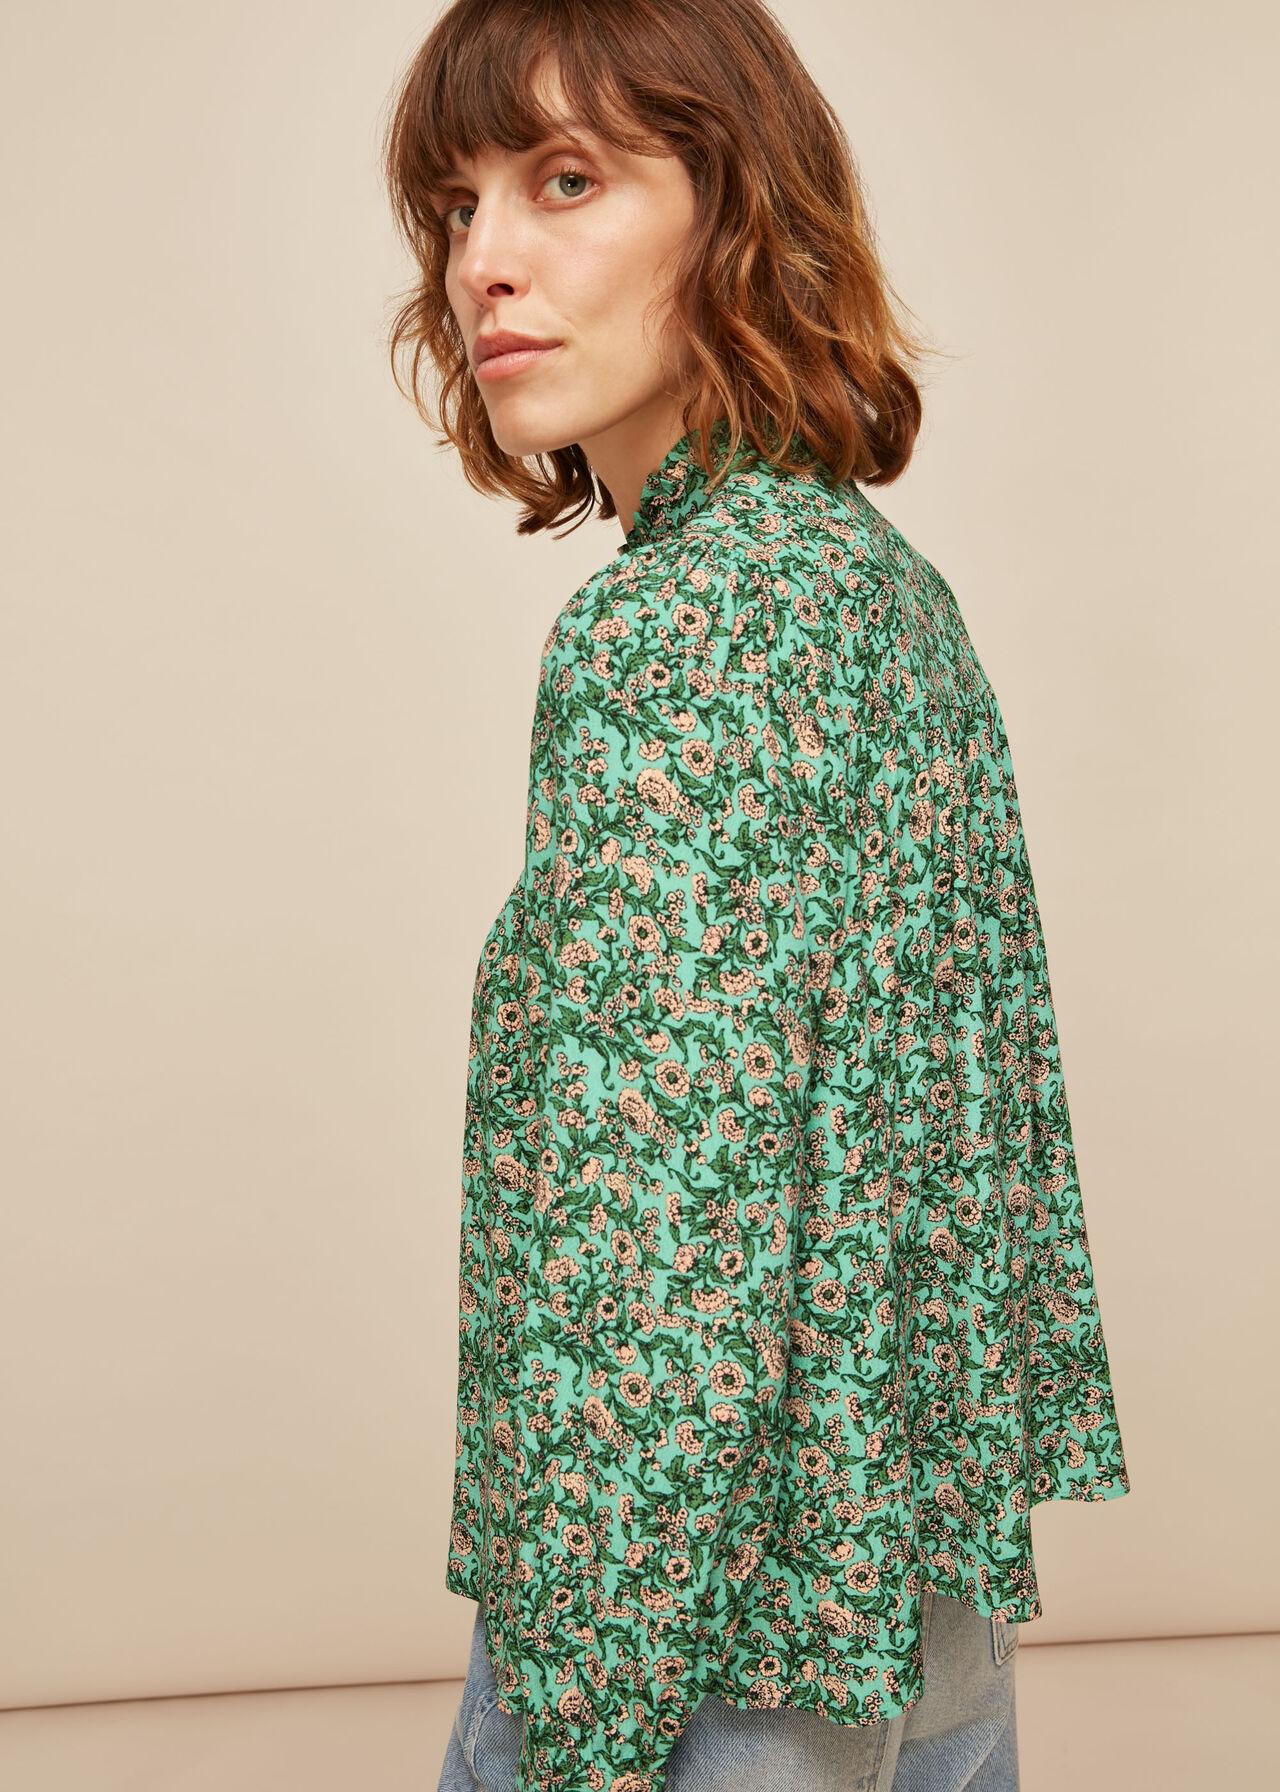 Heath Floral Print Top